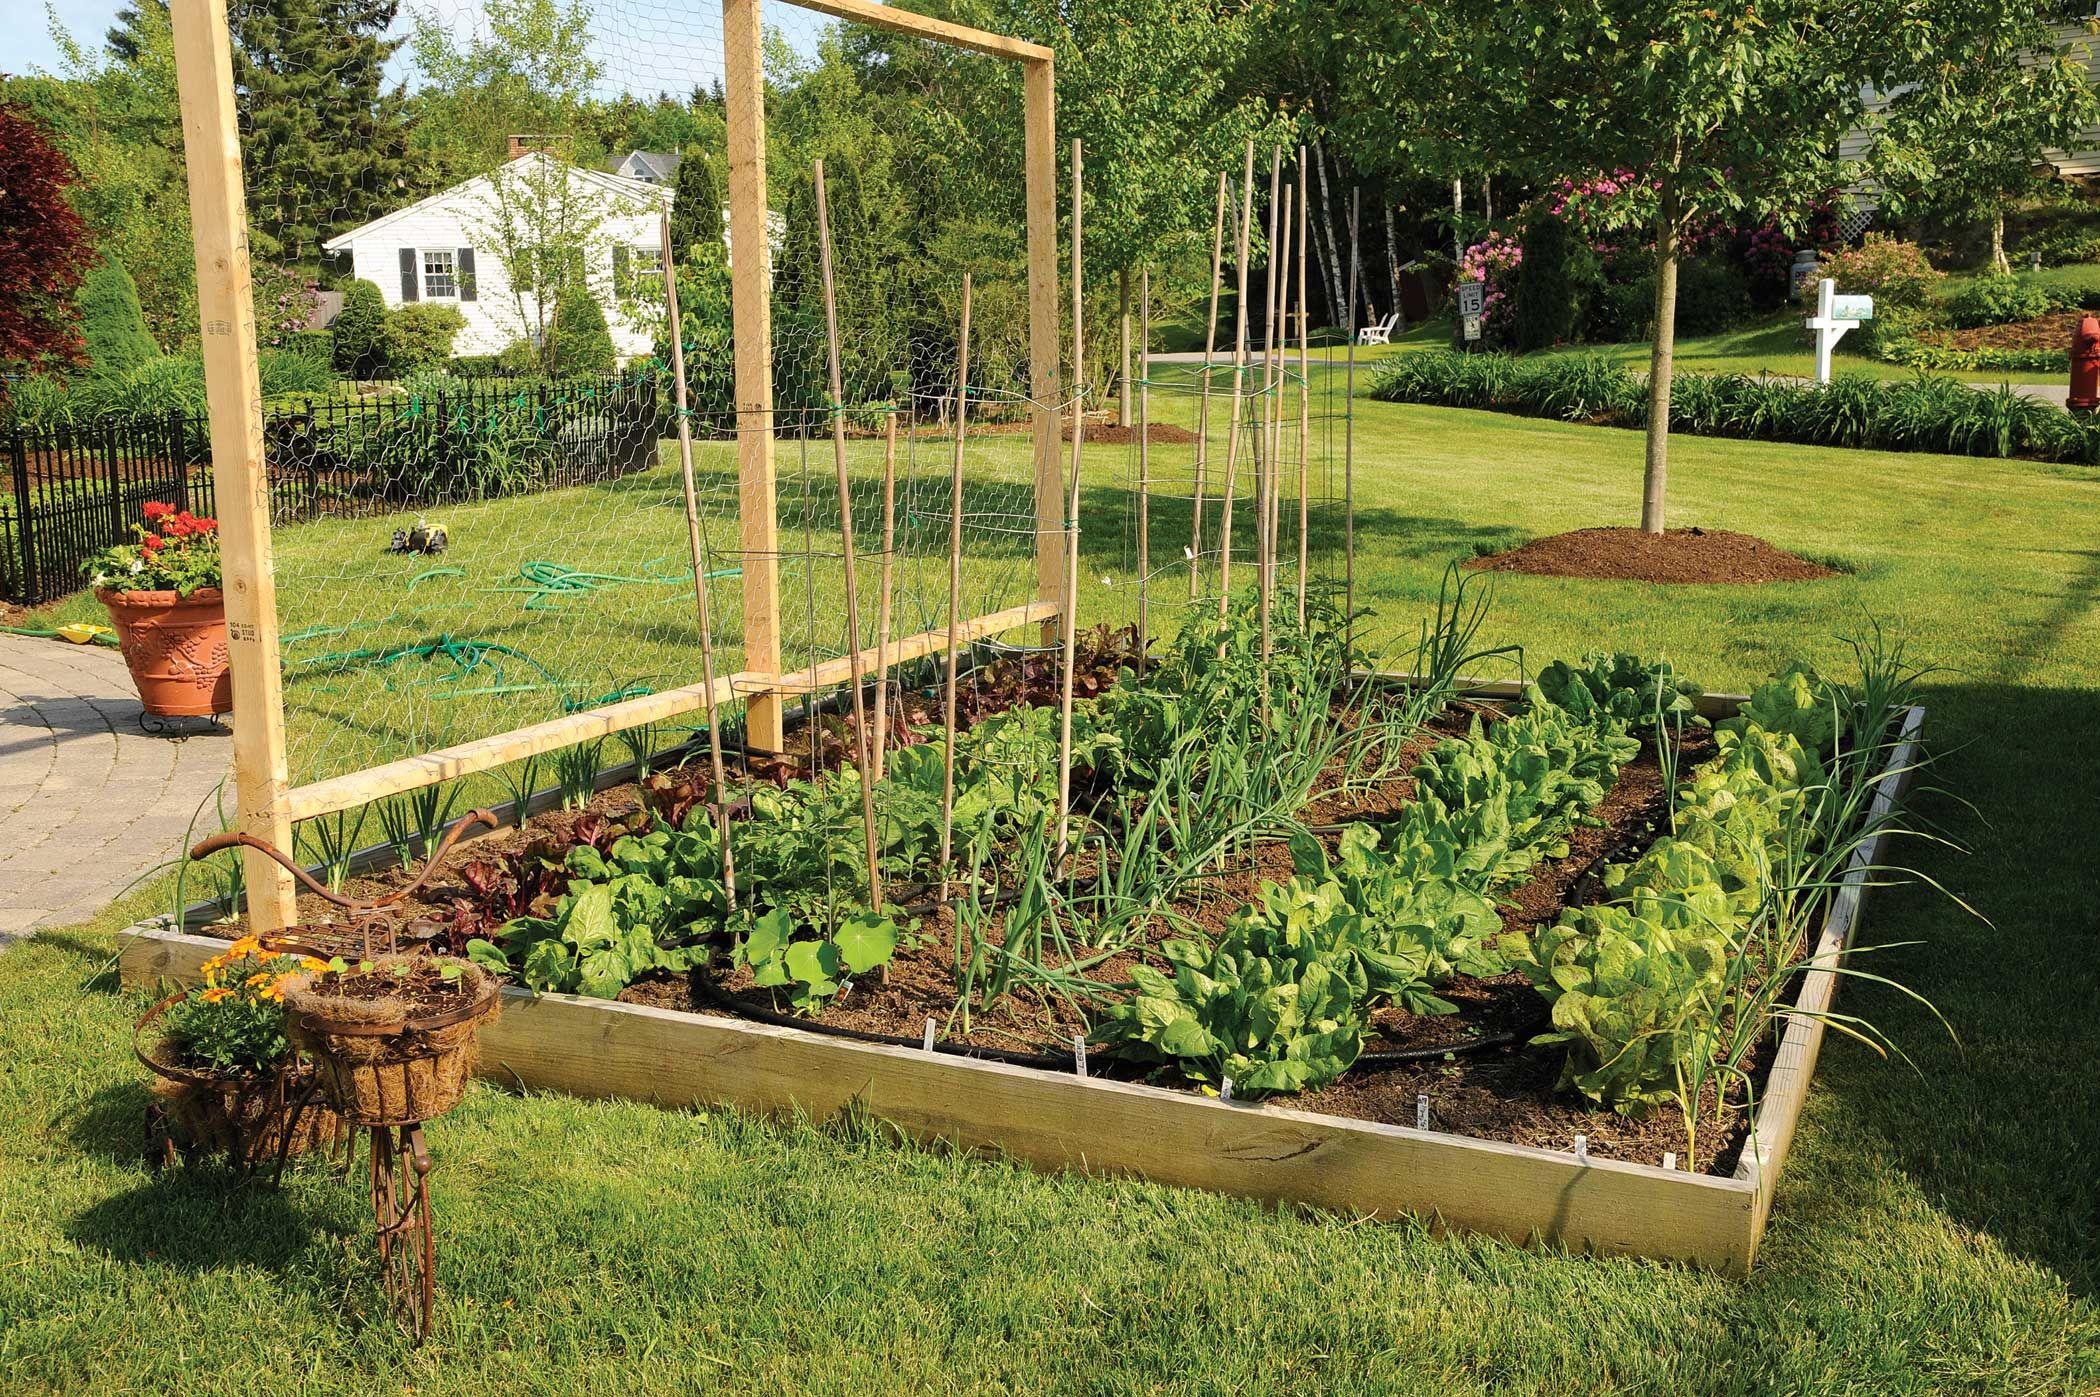 Easy To Build Raised Bed Gardening Plans Using Reclaimed Lumber Garden Layout Vegetable Backyard Vegetable Gardens Vegetable Garden Boxes